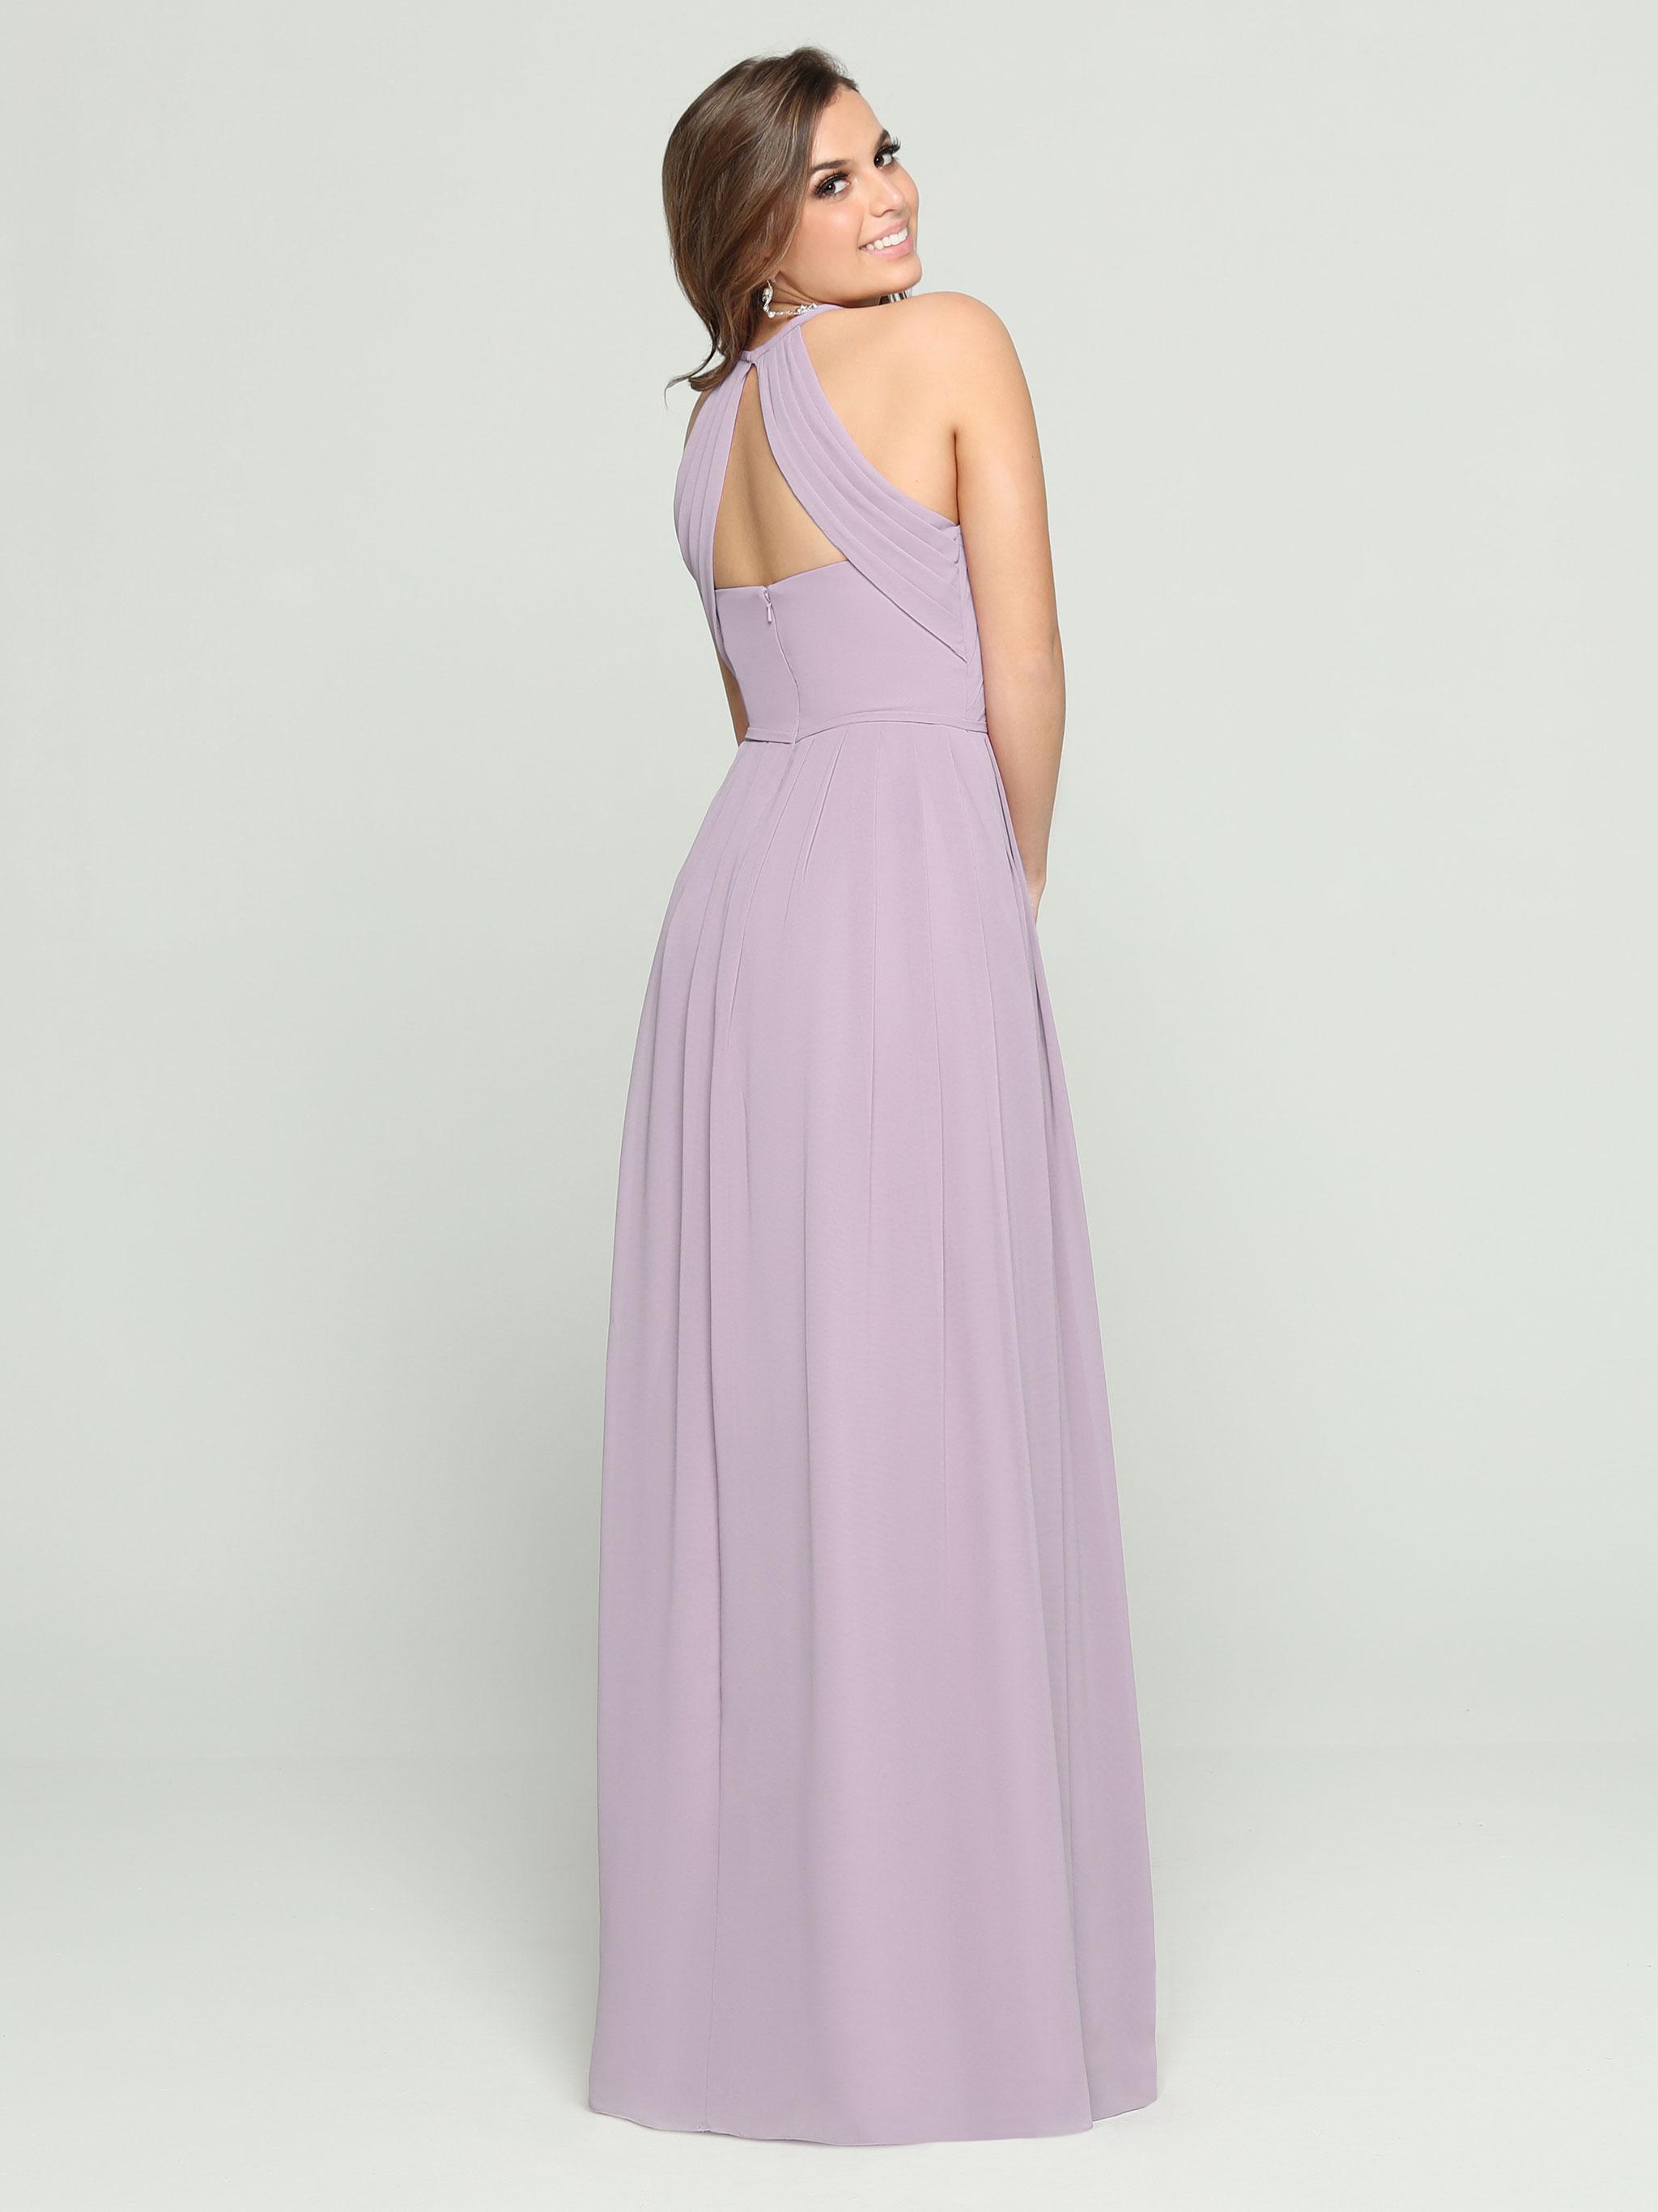 Style #60465